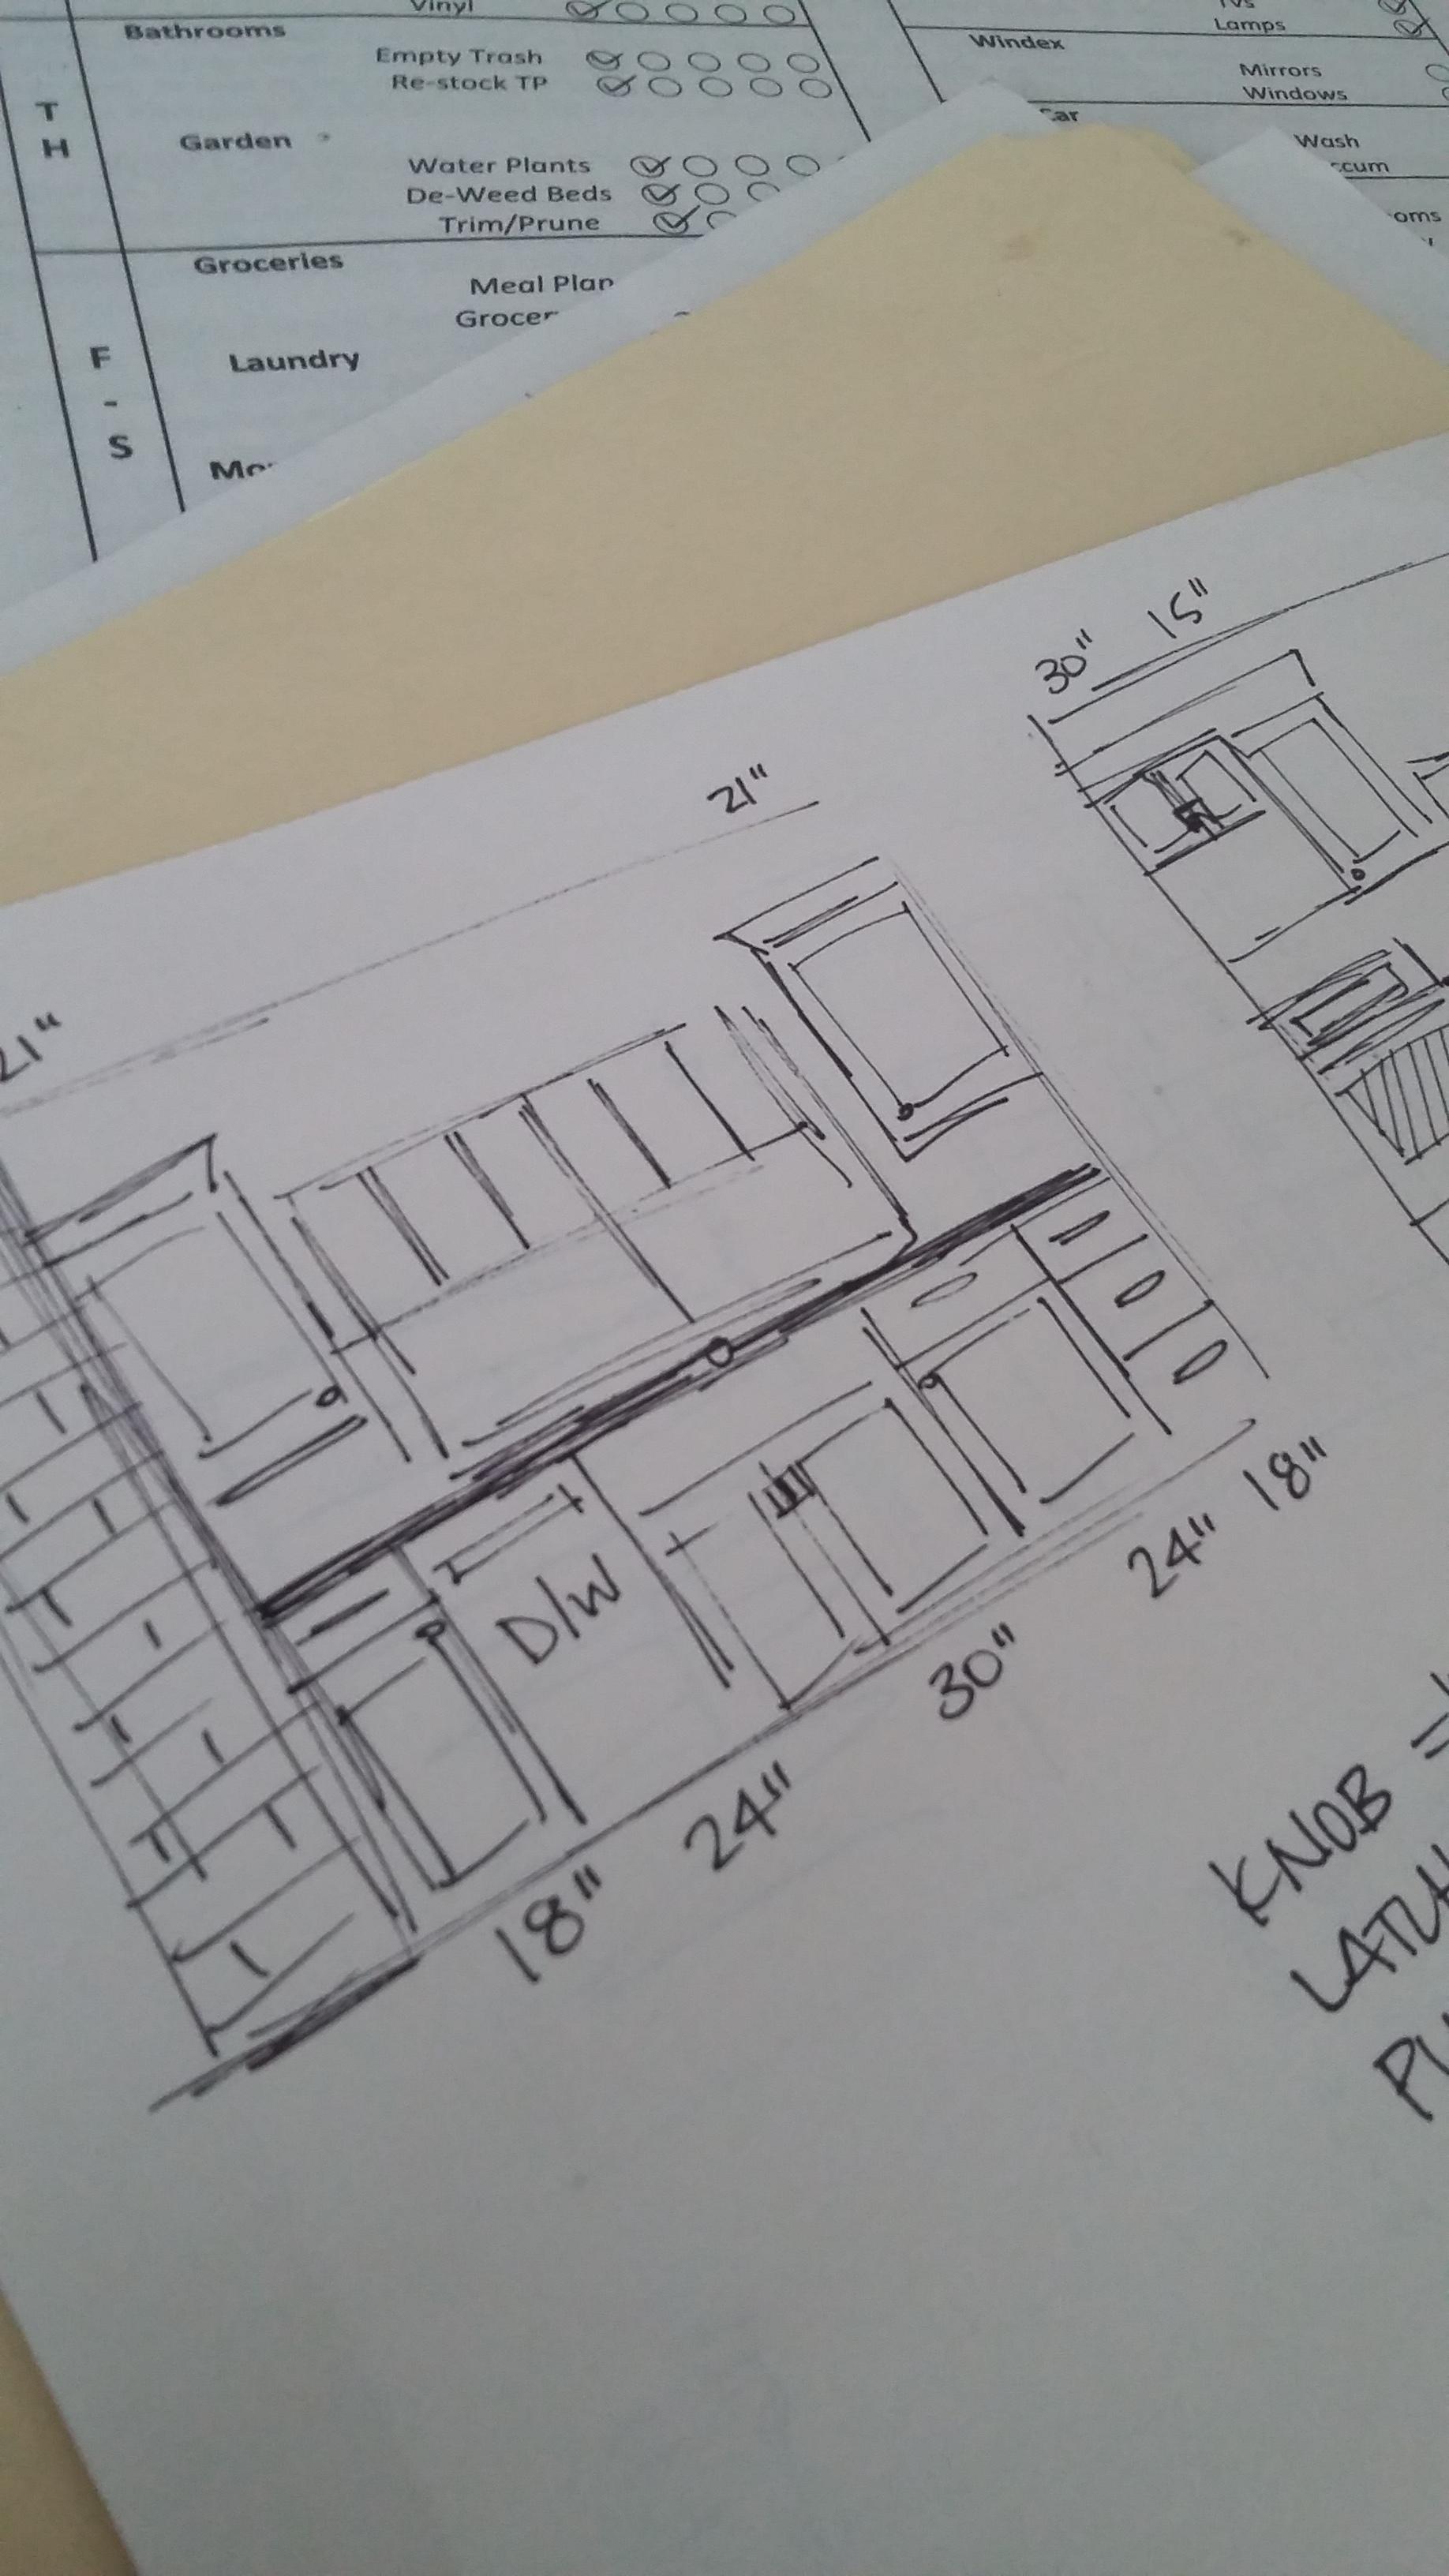 House Flipping - Small Kitchen Layout   Elizabeth Burns Design